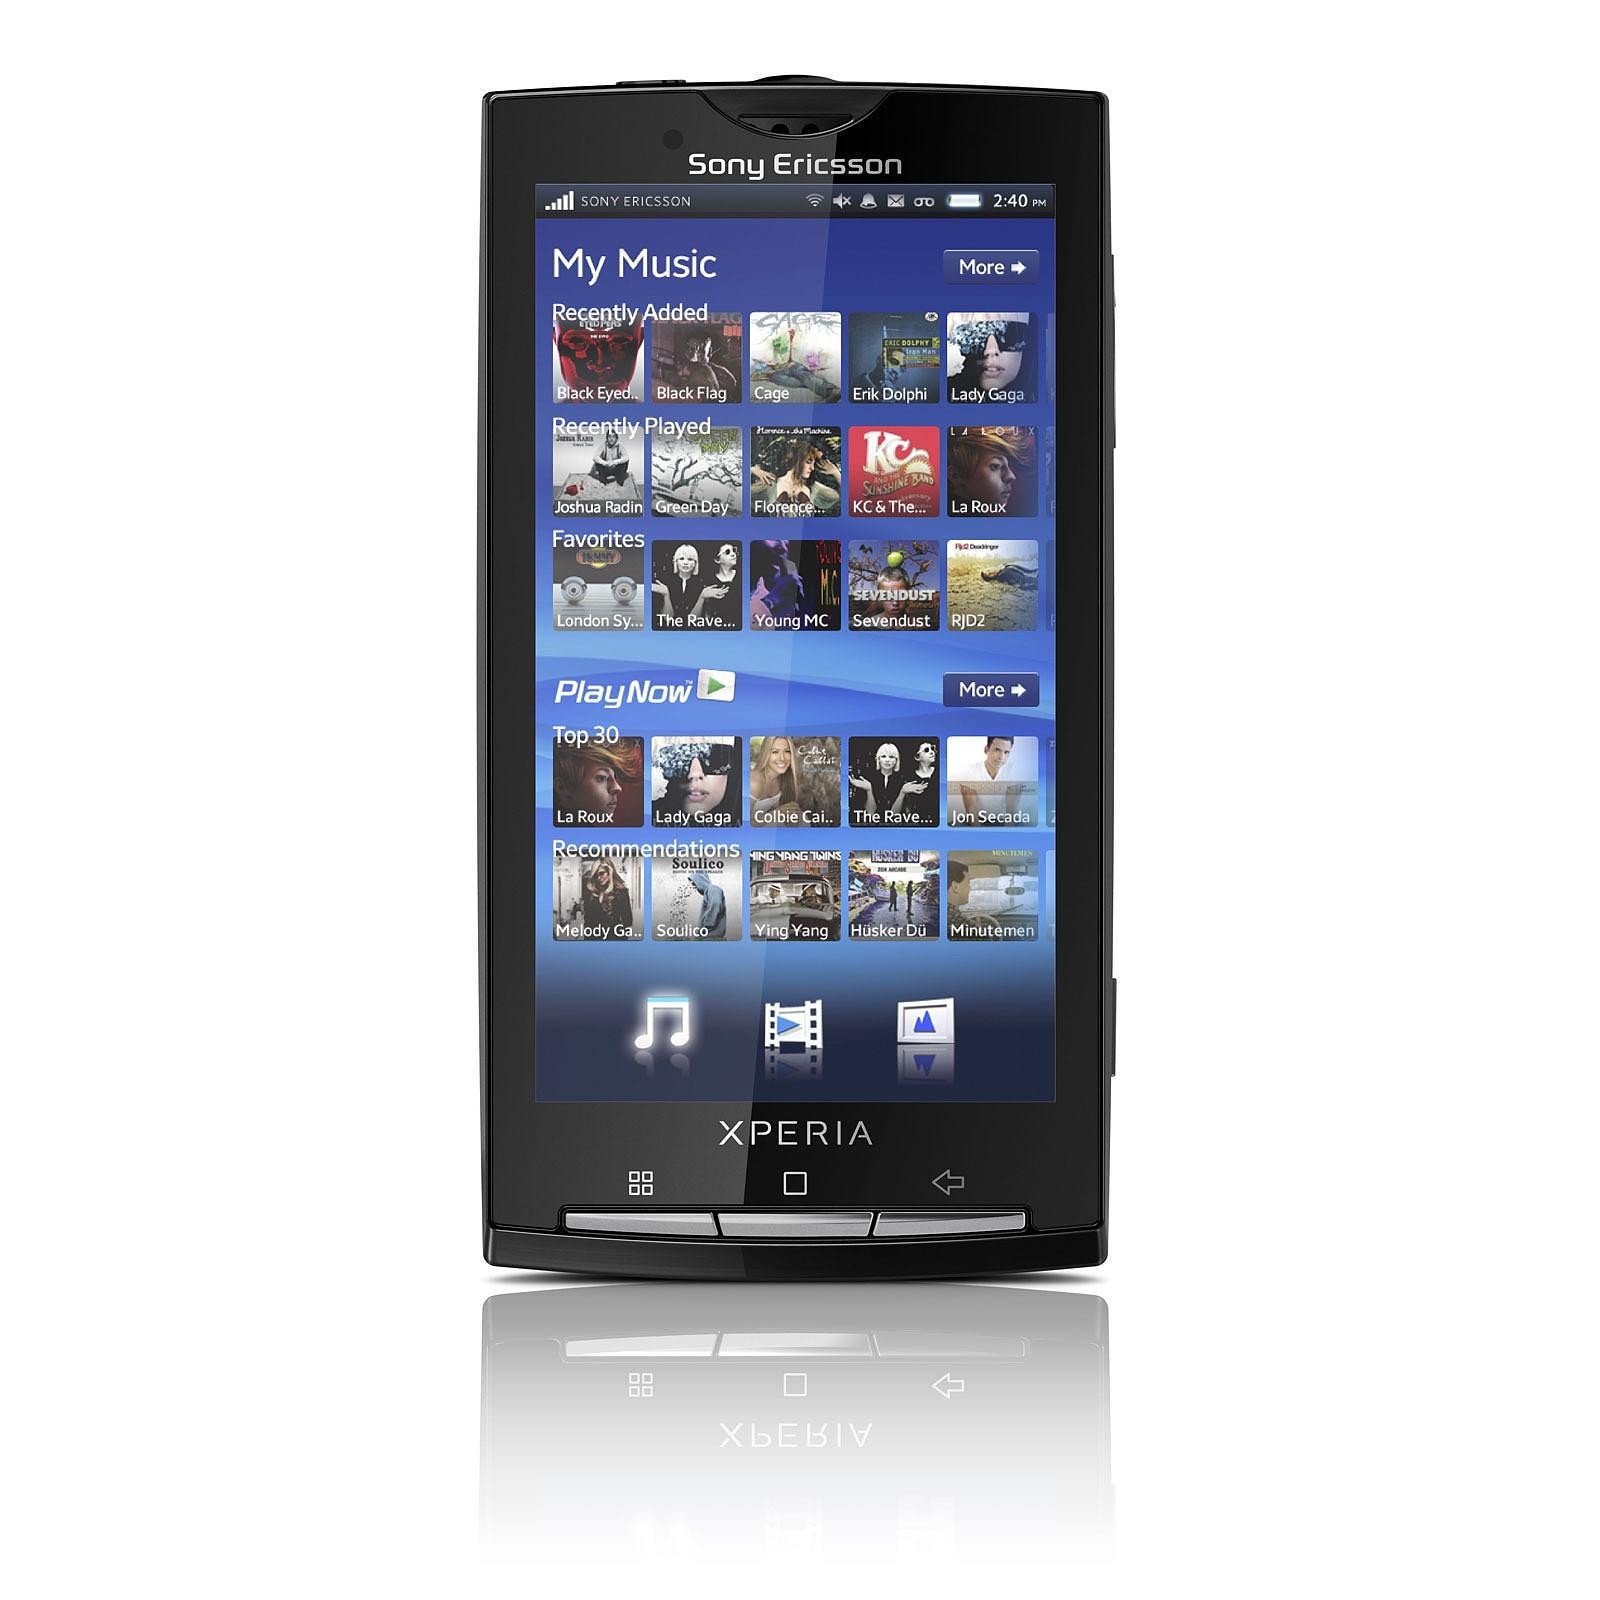 Sony Ericsson Xperia X10 Noir